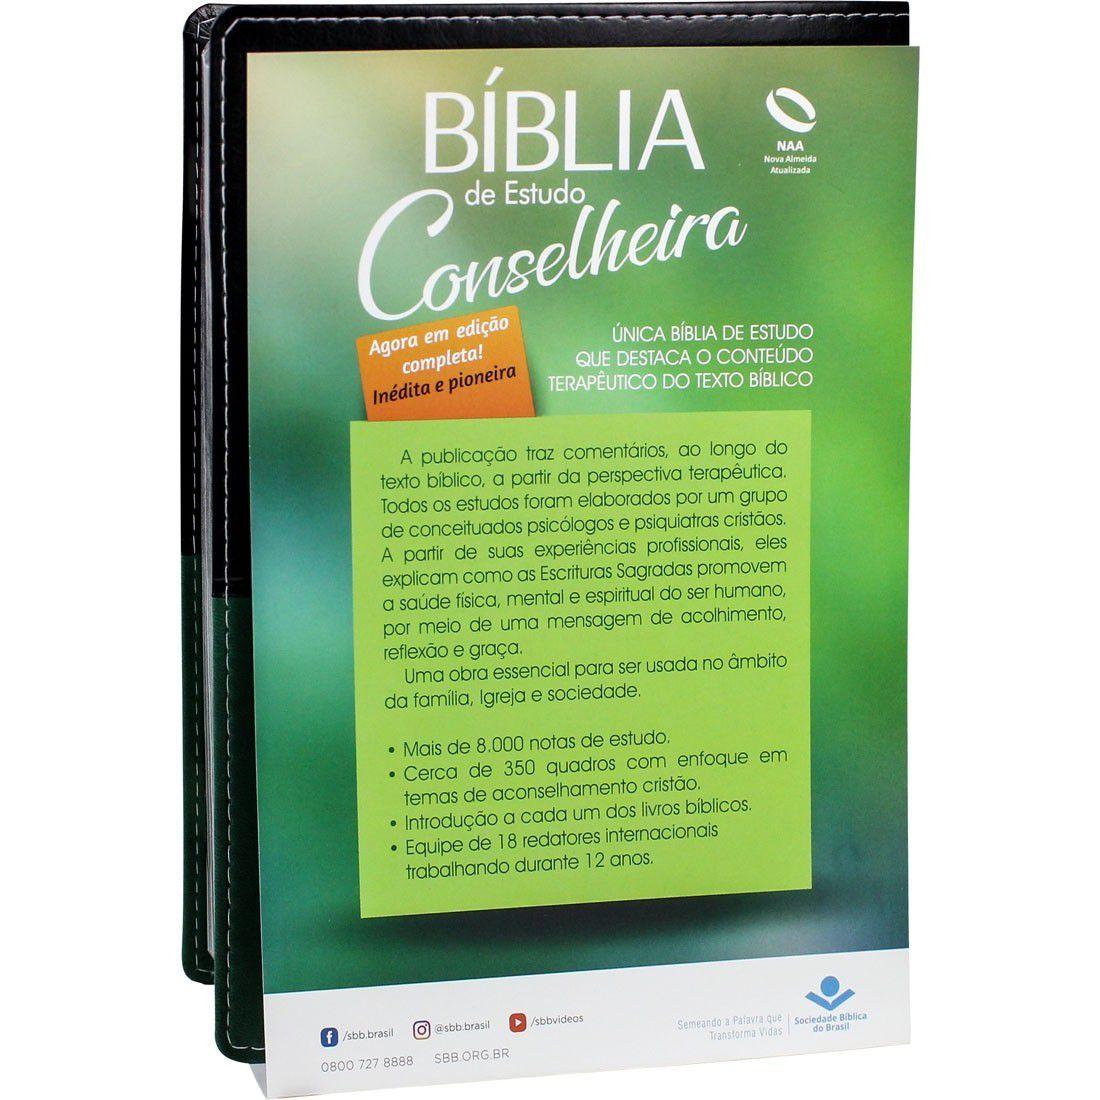 Bíblia de Estudo Conselheira